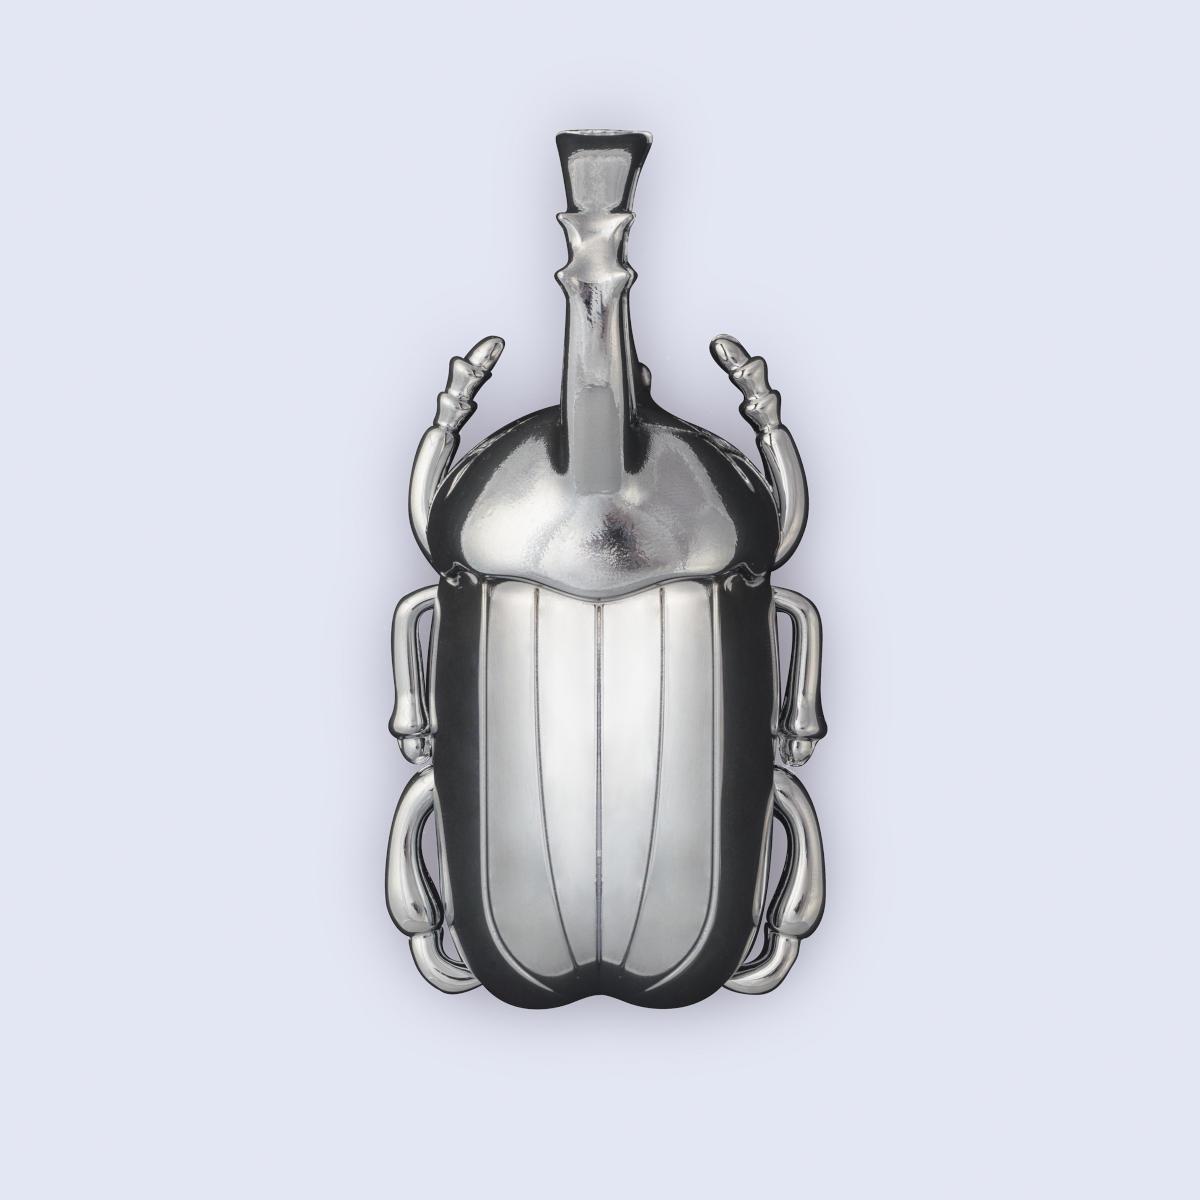 Insectum Kapsylöppnare - Silver REA 50%